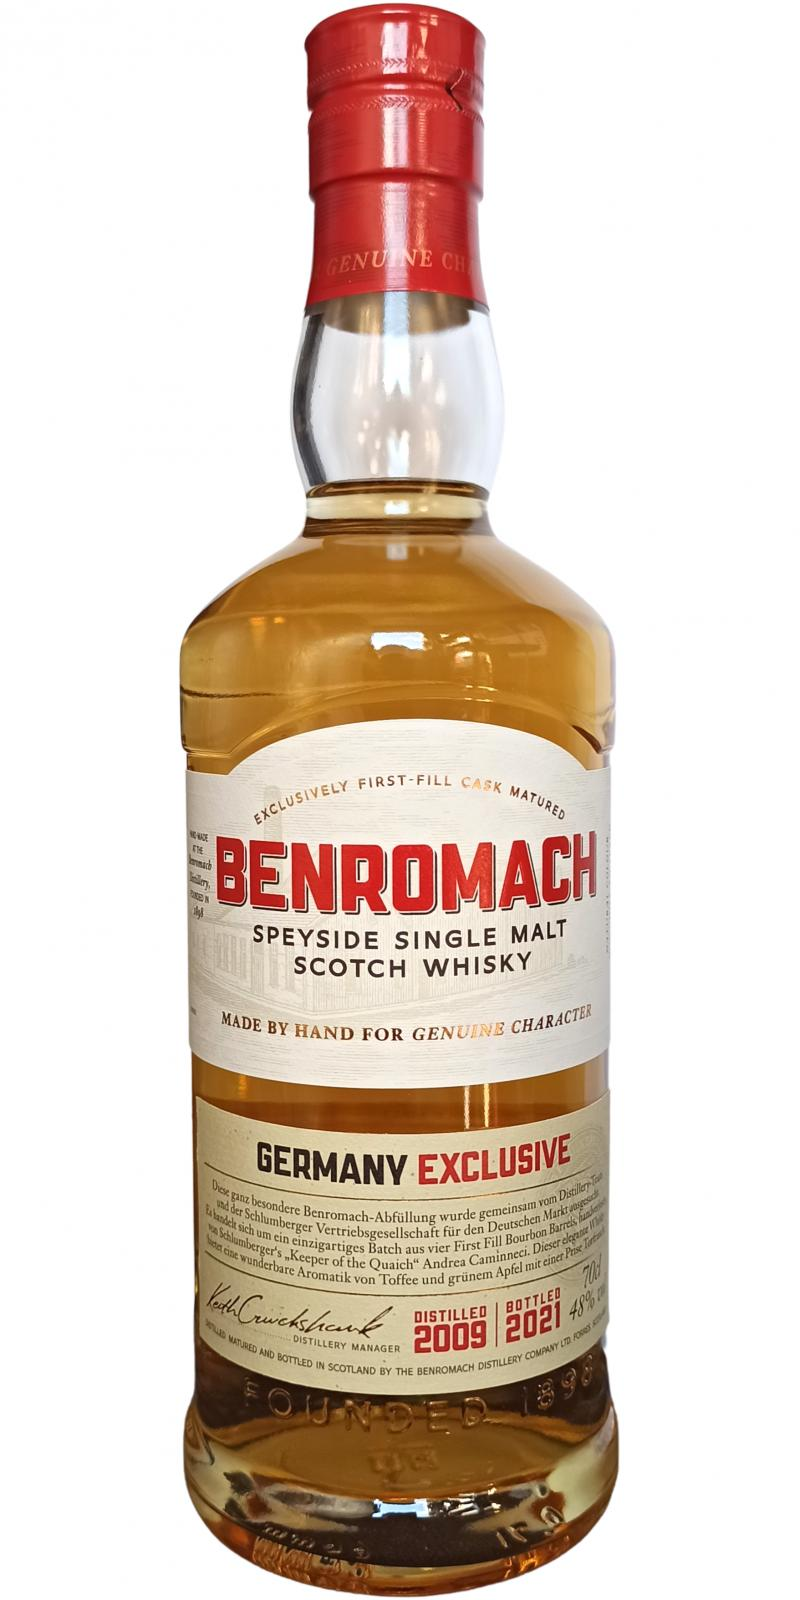 Benromach 2009